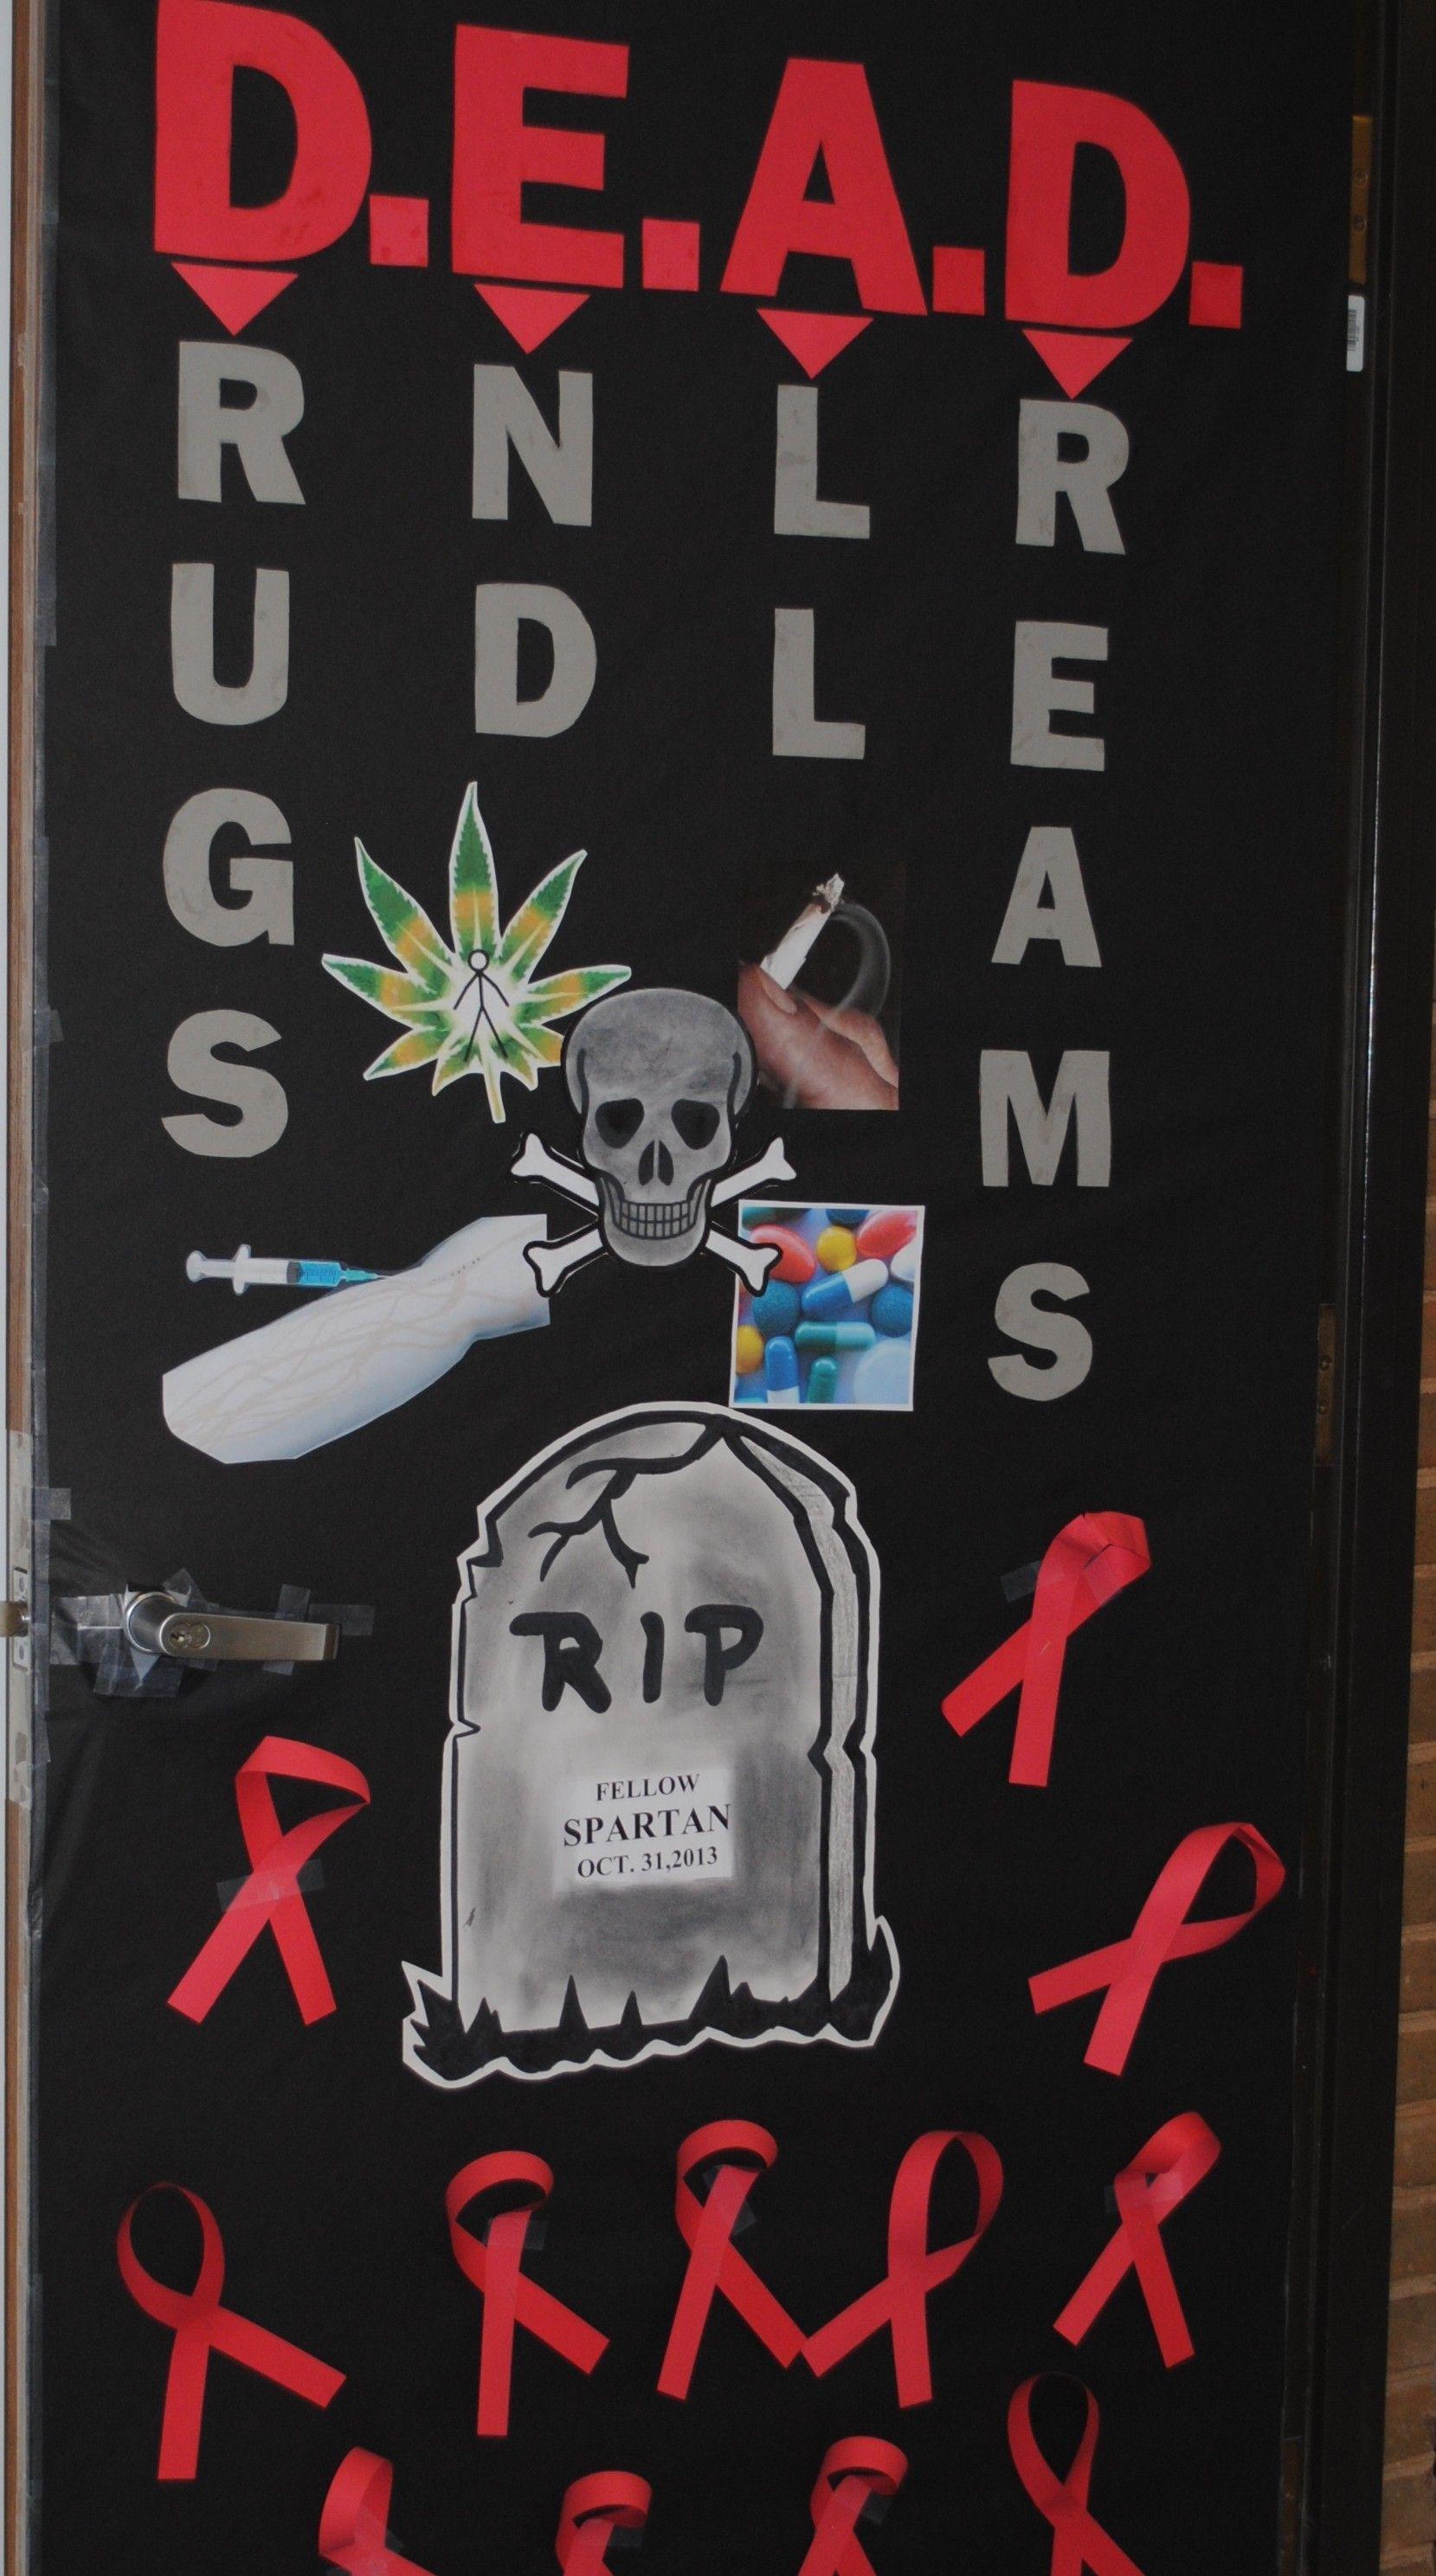 Red Ribbon Week Door Drug Free Door Decorations Red Ribbon